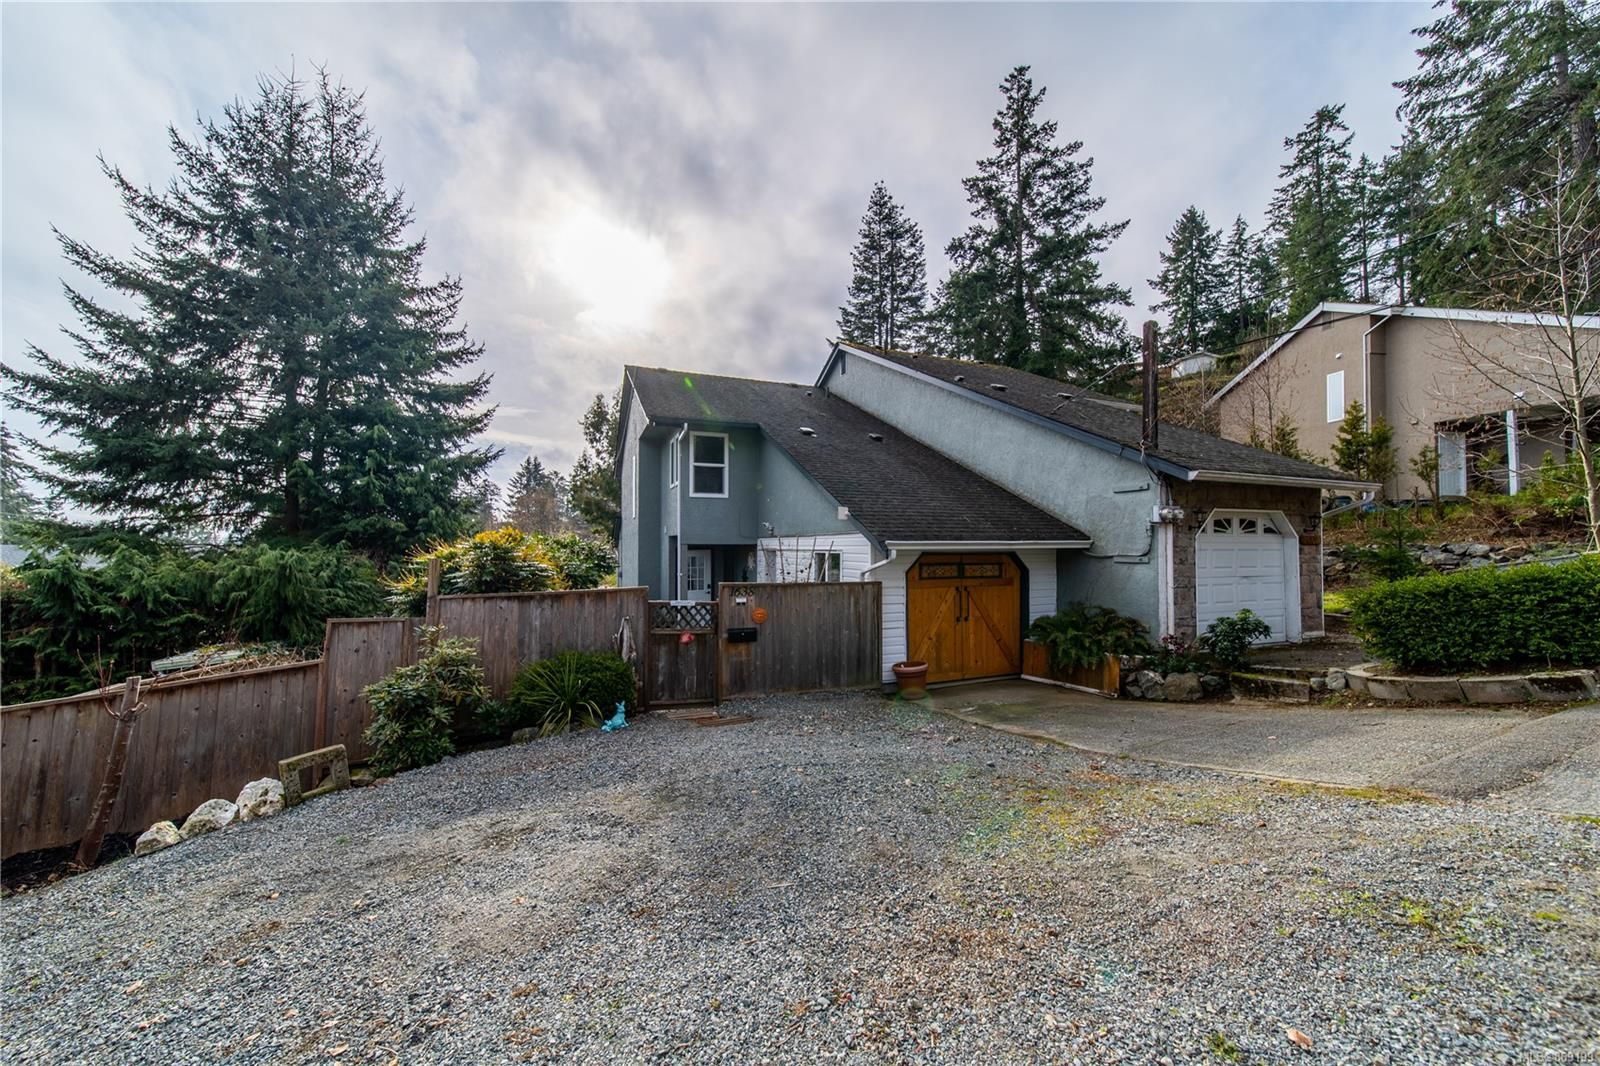 Main Photo: 1638 Sheriff Way in : Na Hammond Bay Half Duplex for sale (Nanaimo)  : MLS®# 869199